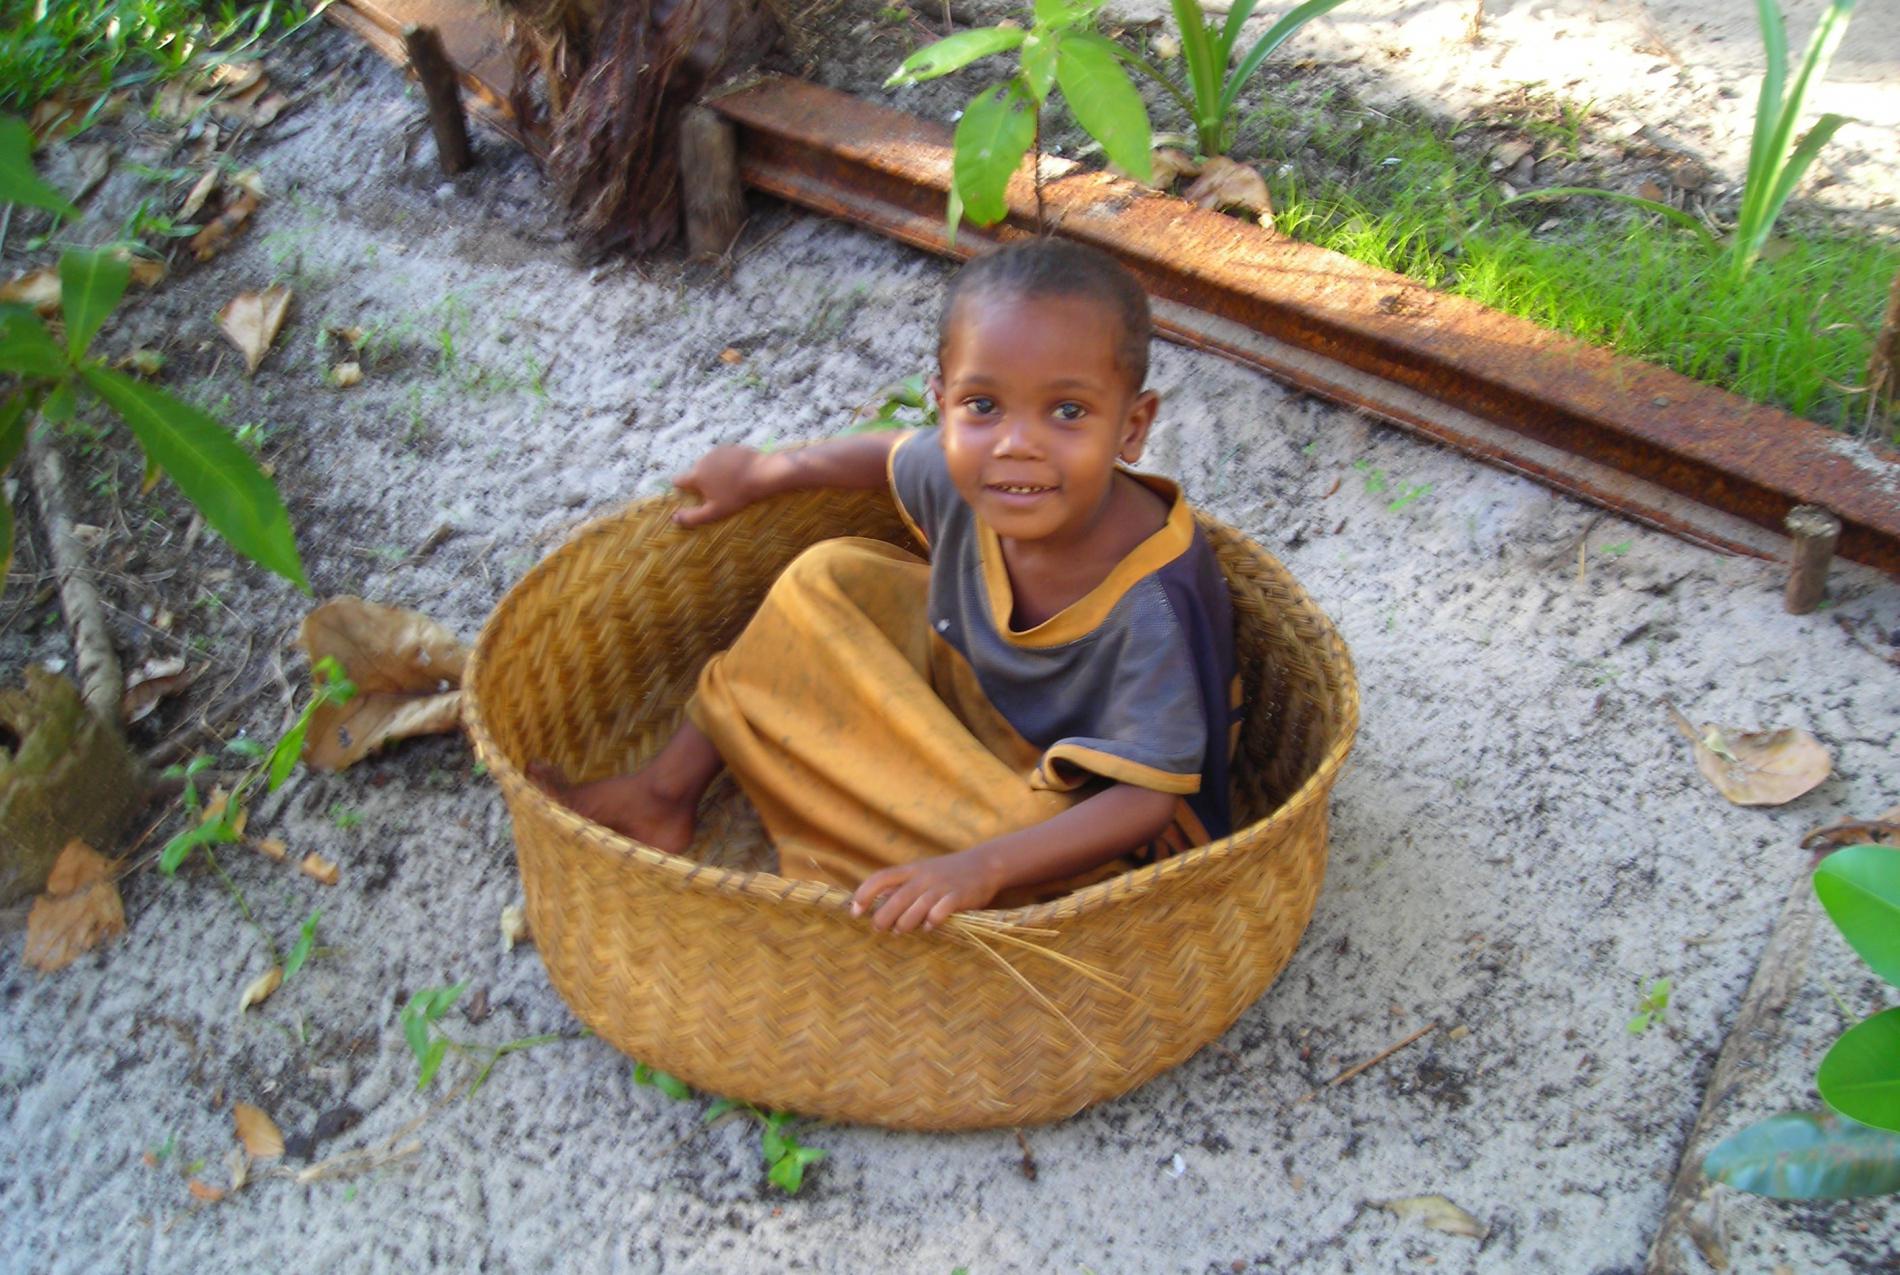 Voyage solidaire Madagascar : Vision du Monde - Photo 5